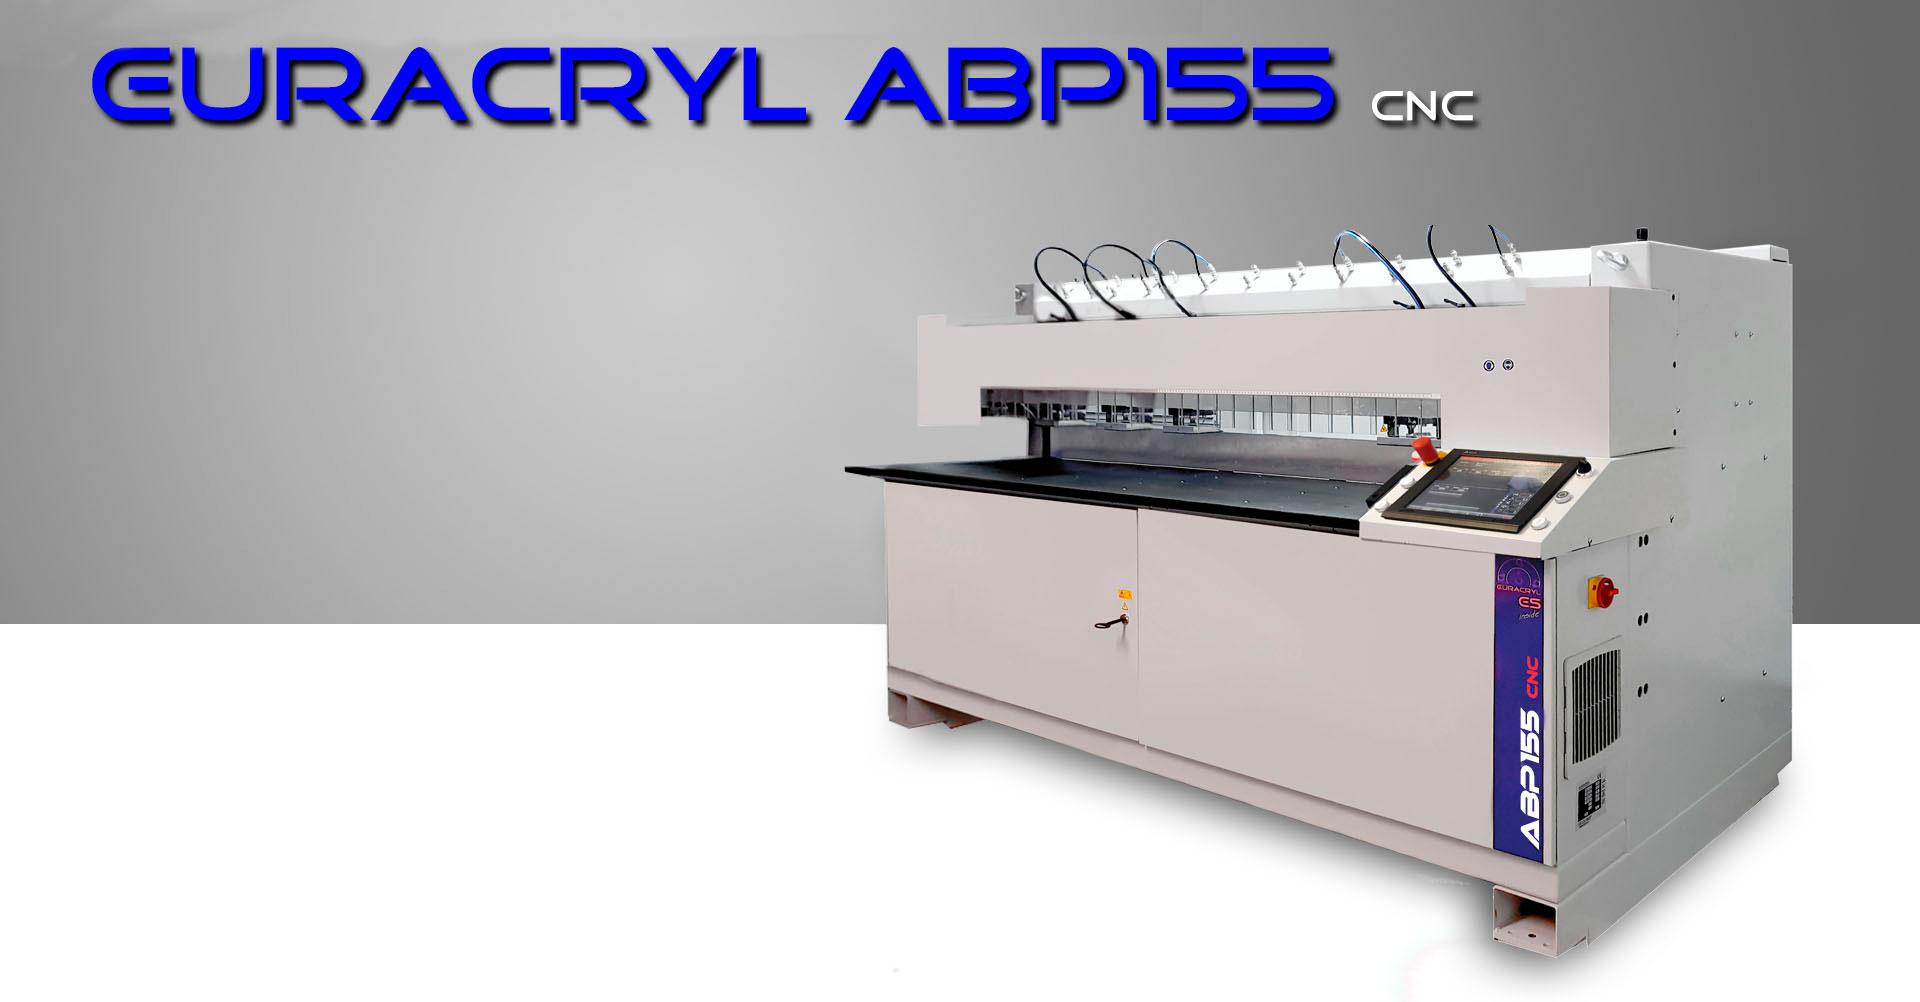 abp155cnc Euracryl gmbh kantenpoliermschinen